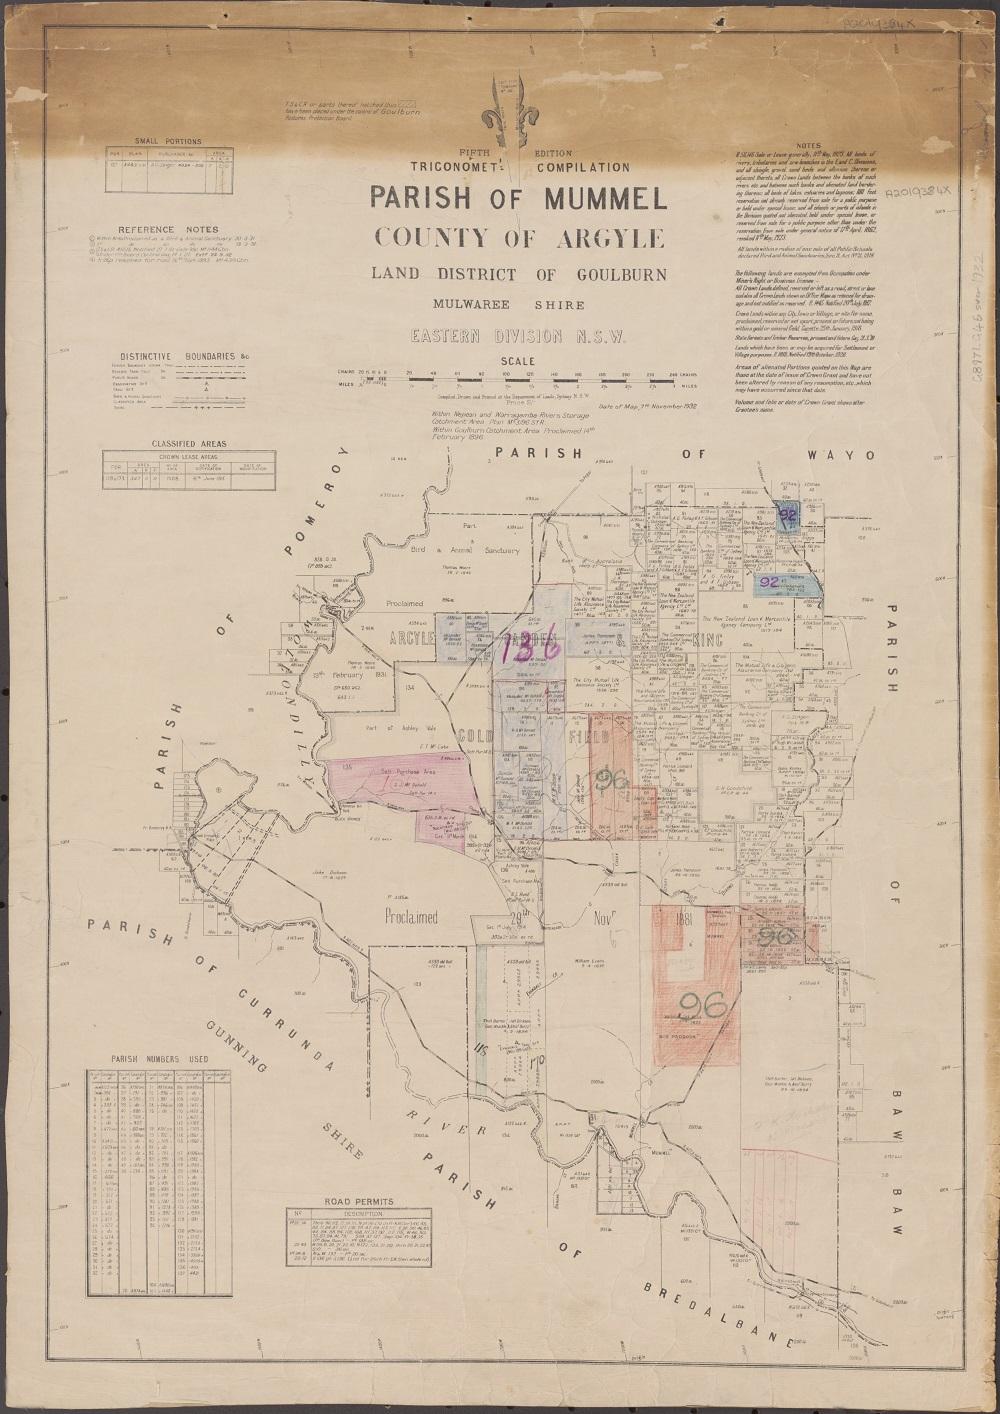 Mummel Parish Map_nla.obj-233306698-2